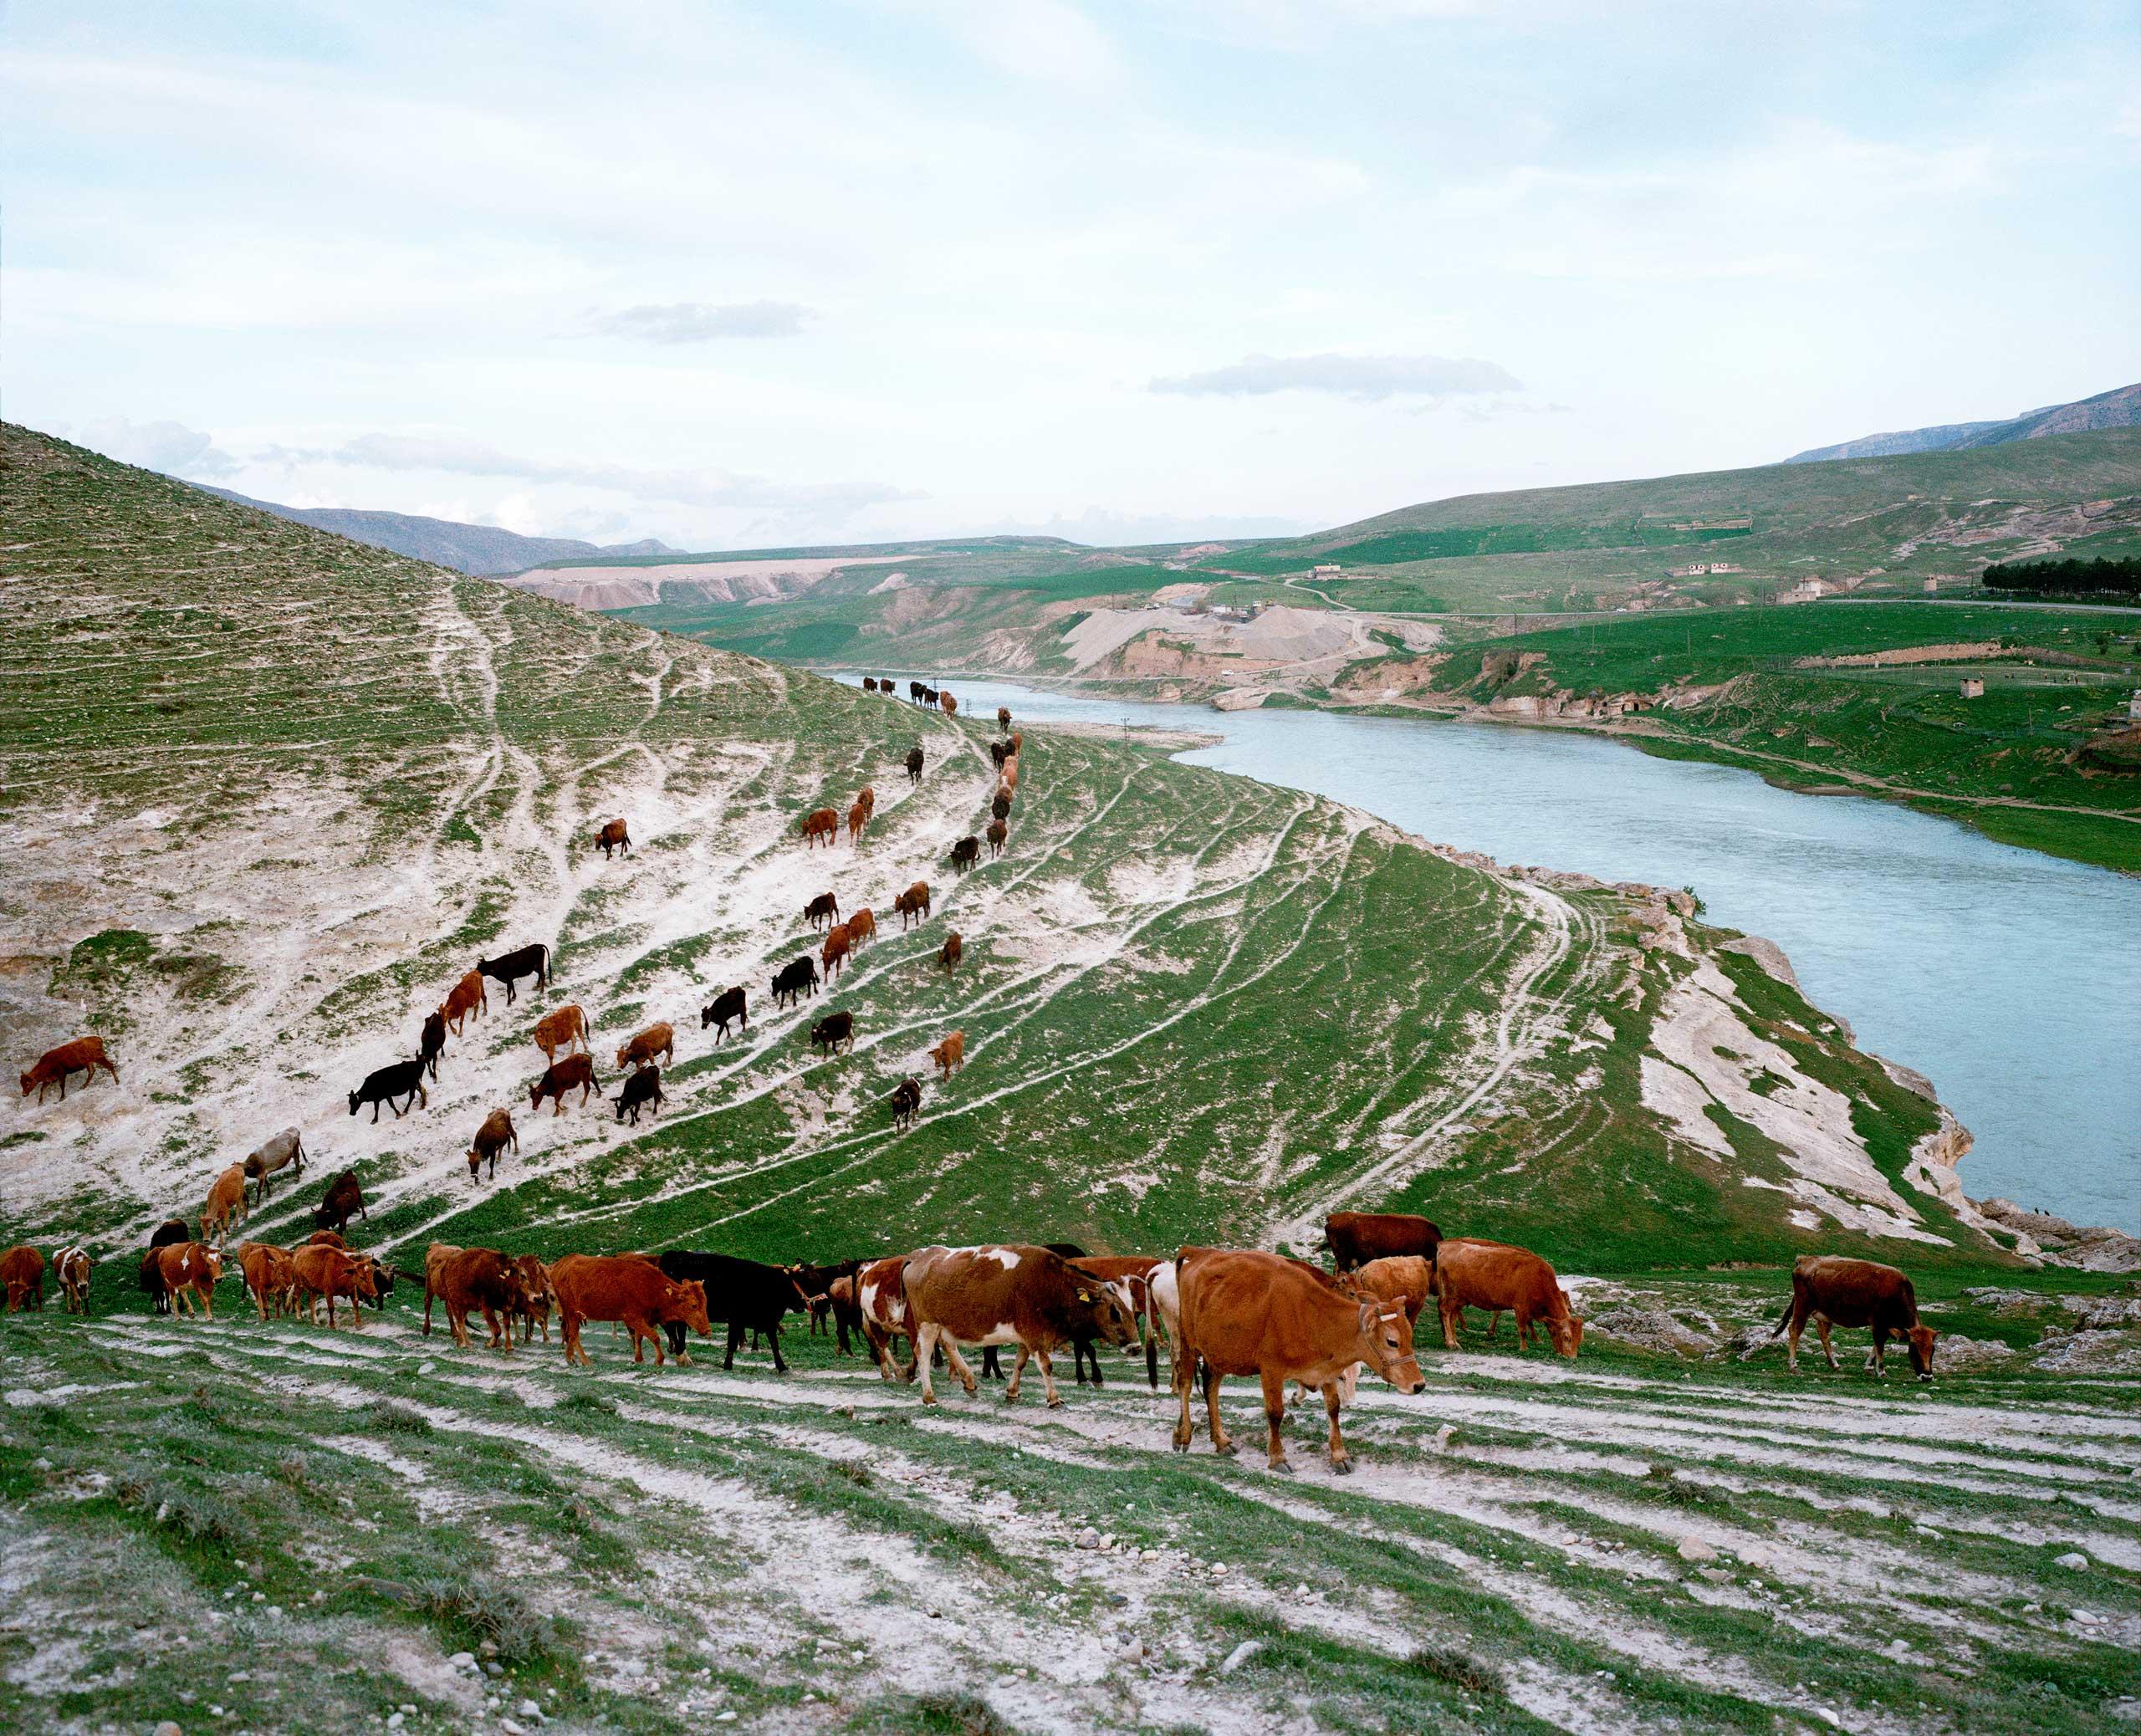 A herd of cattle walk back toward the village by the banks of the Tigris River. Kesmeköprü, Turkey.